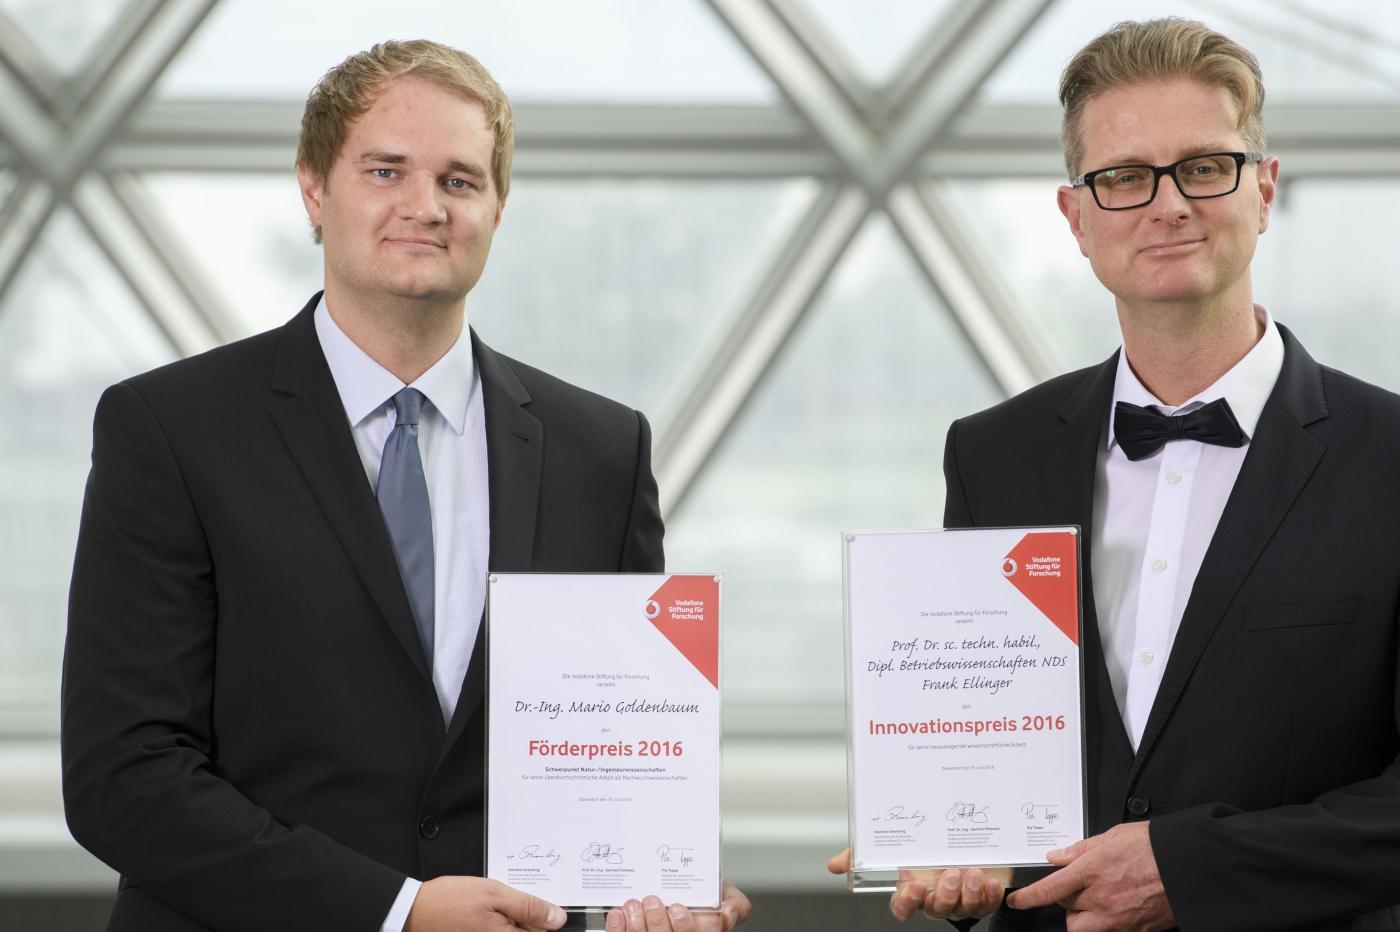 Innovationspreis für Frank Ellinger, Förderpreis für Mario Goldenbaum